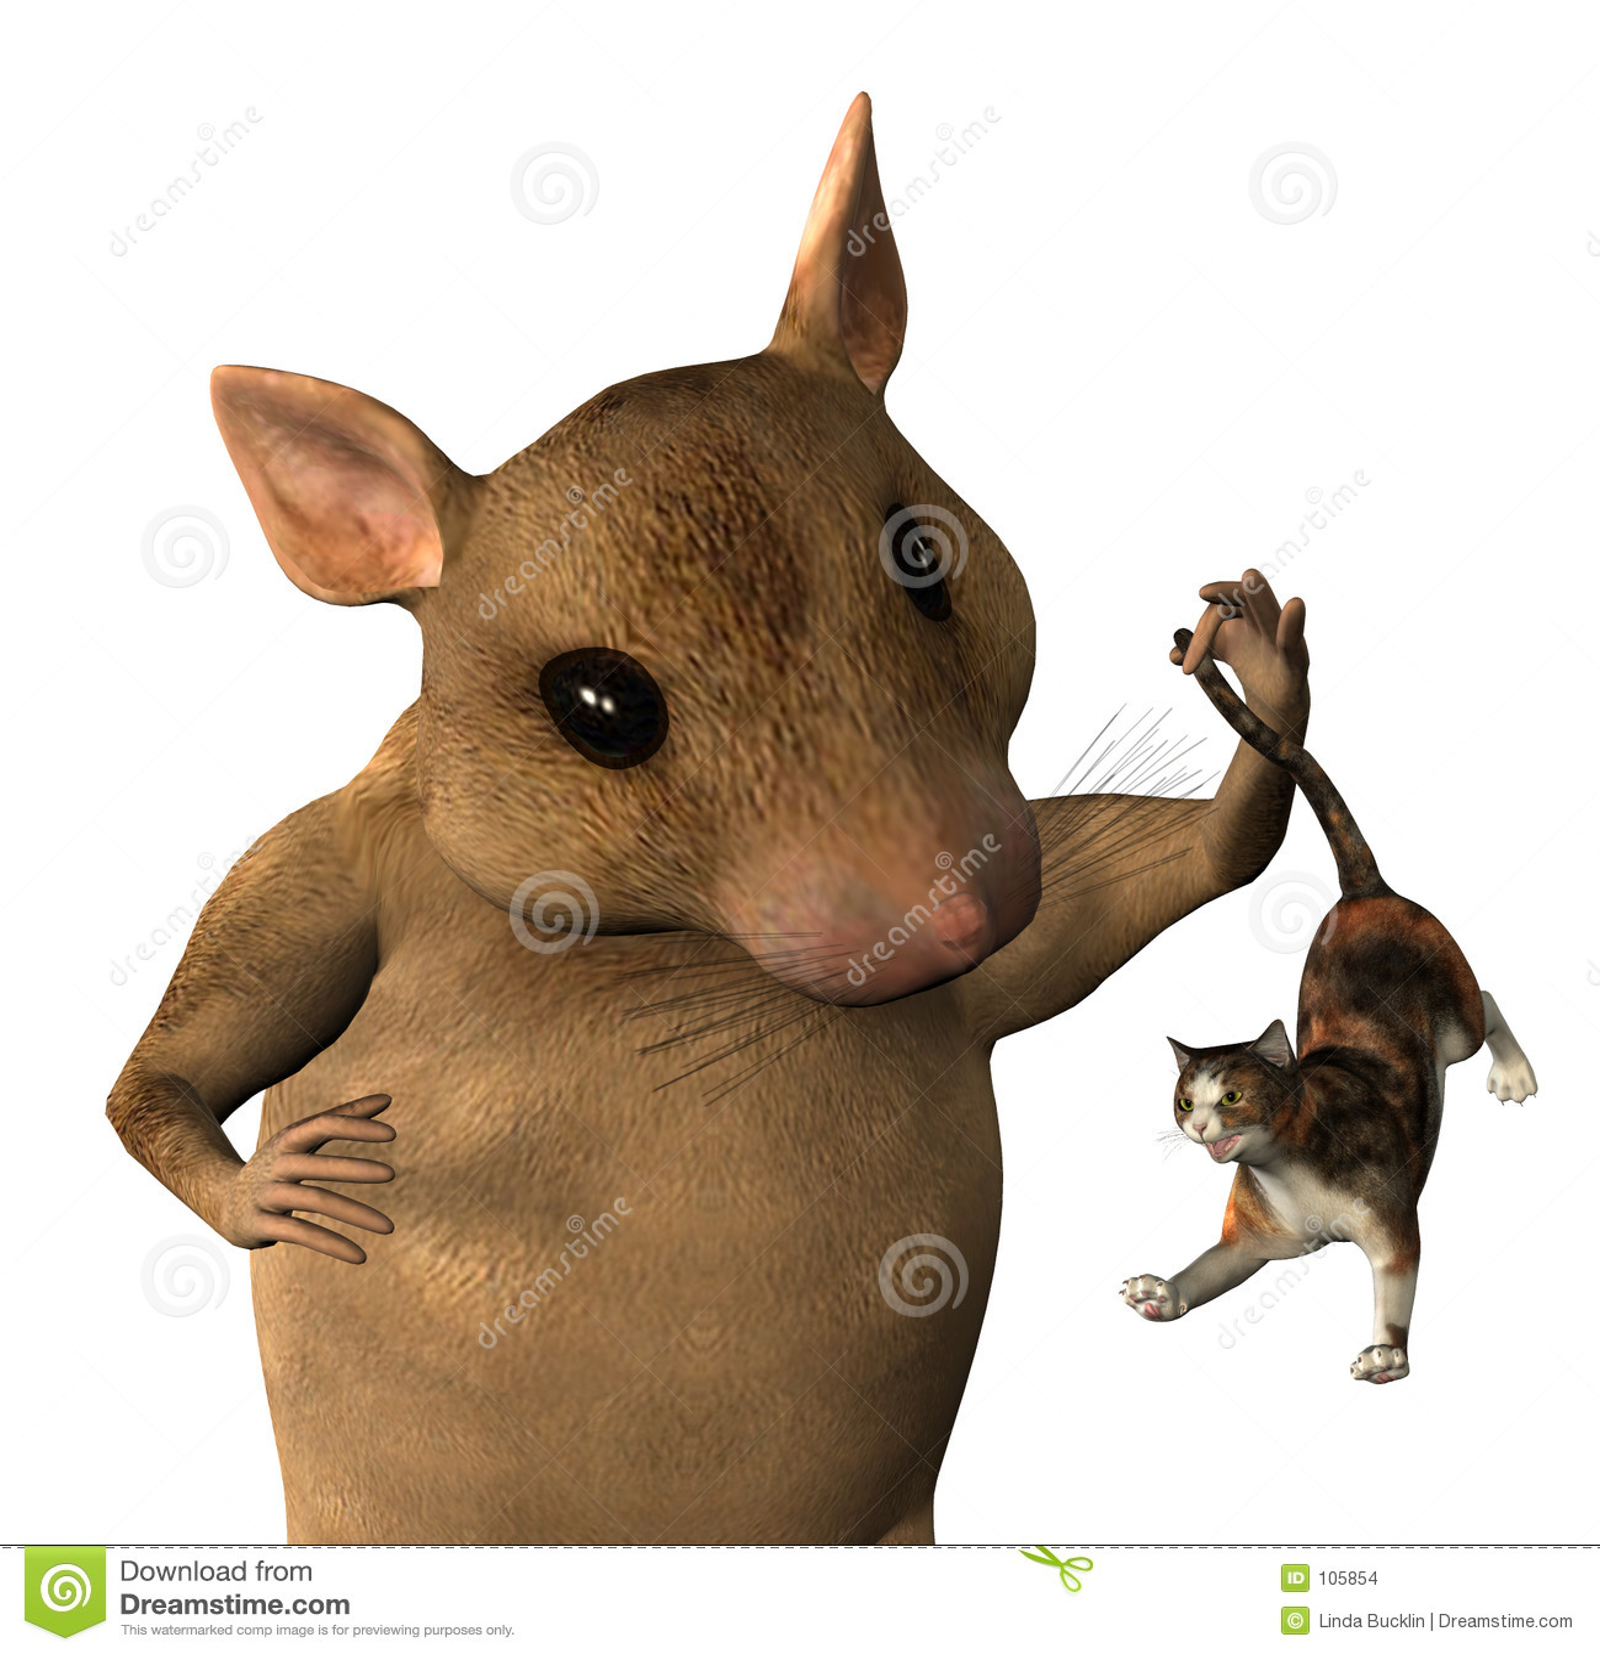 Fantasia do rato - close-cropped